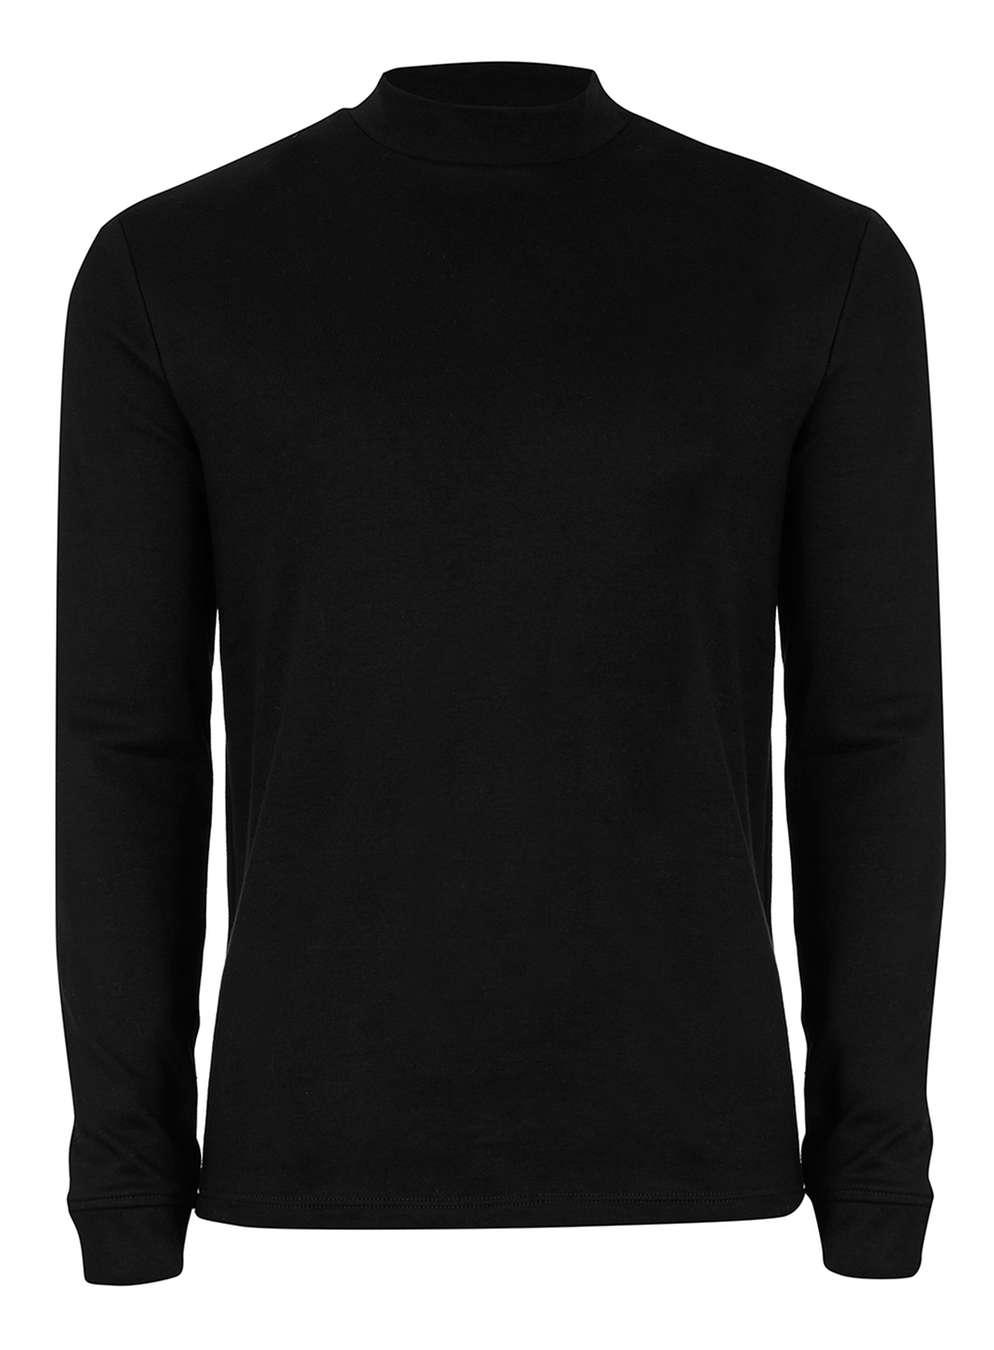 TOPMAN PREMIUM Black Turtle Neck Long Sleeve T-Shirt , £30